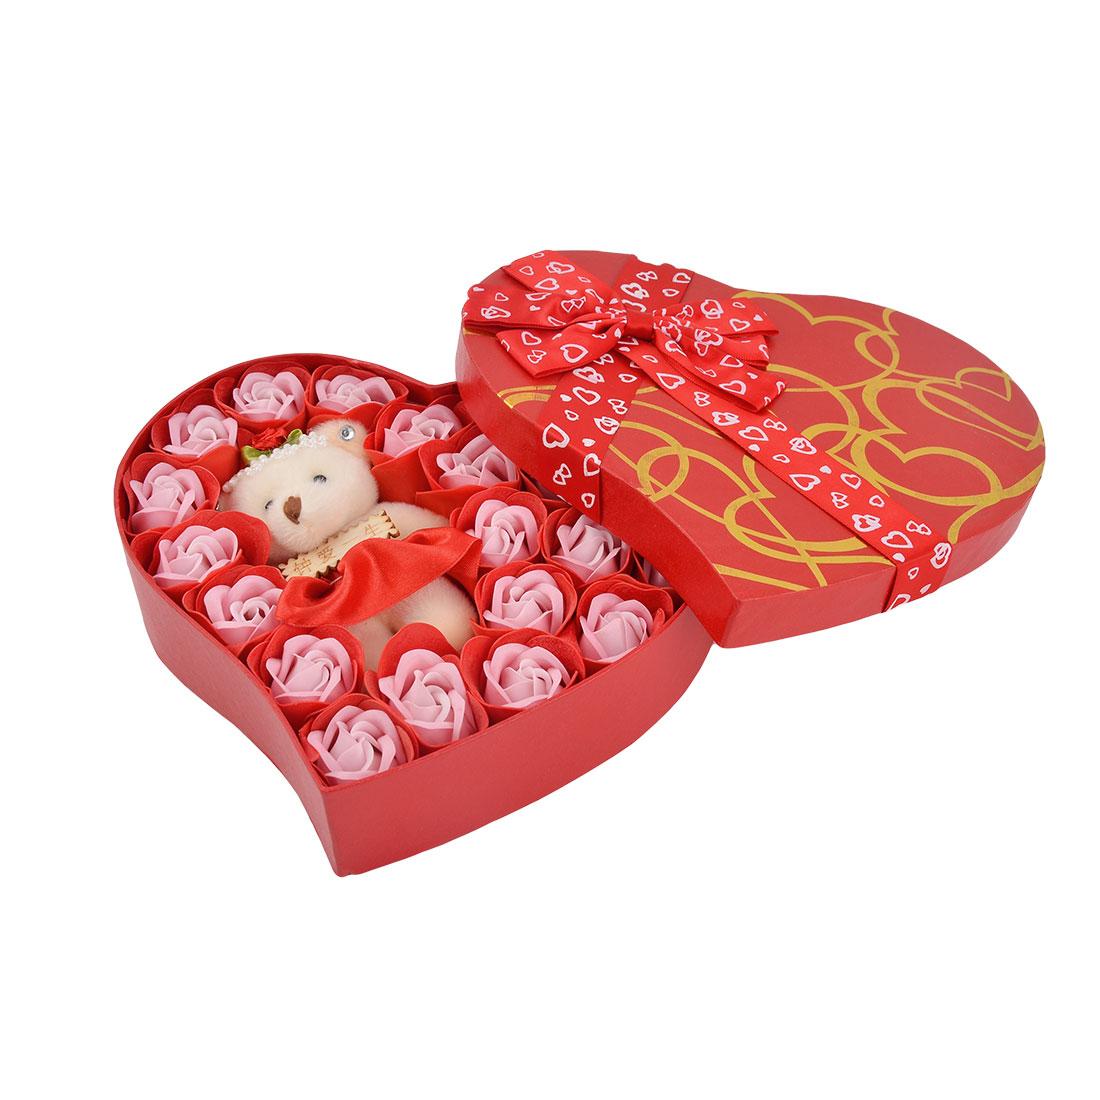 Festival Gift Heart Shaped Box Artificial Rose Flower Decor Bath Soap Petal Red 22 in 1